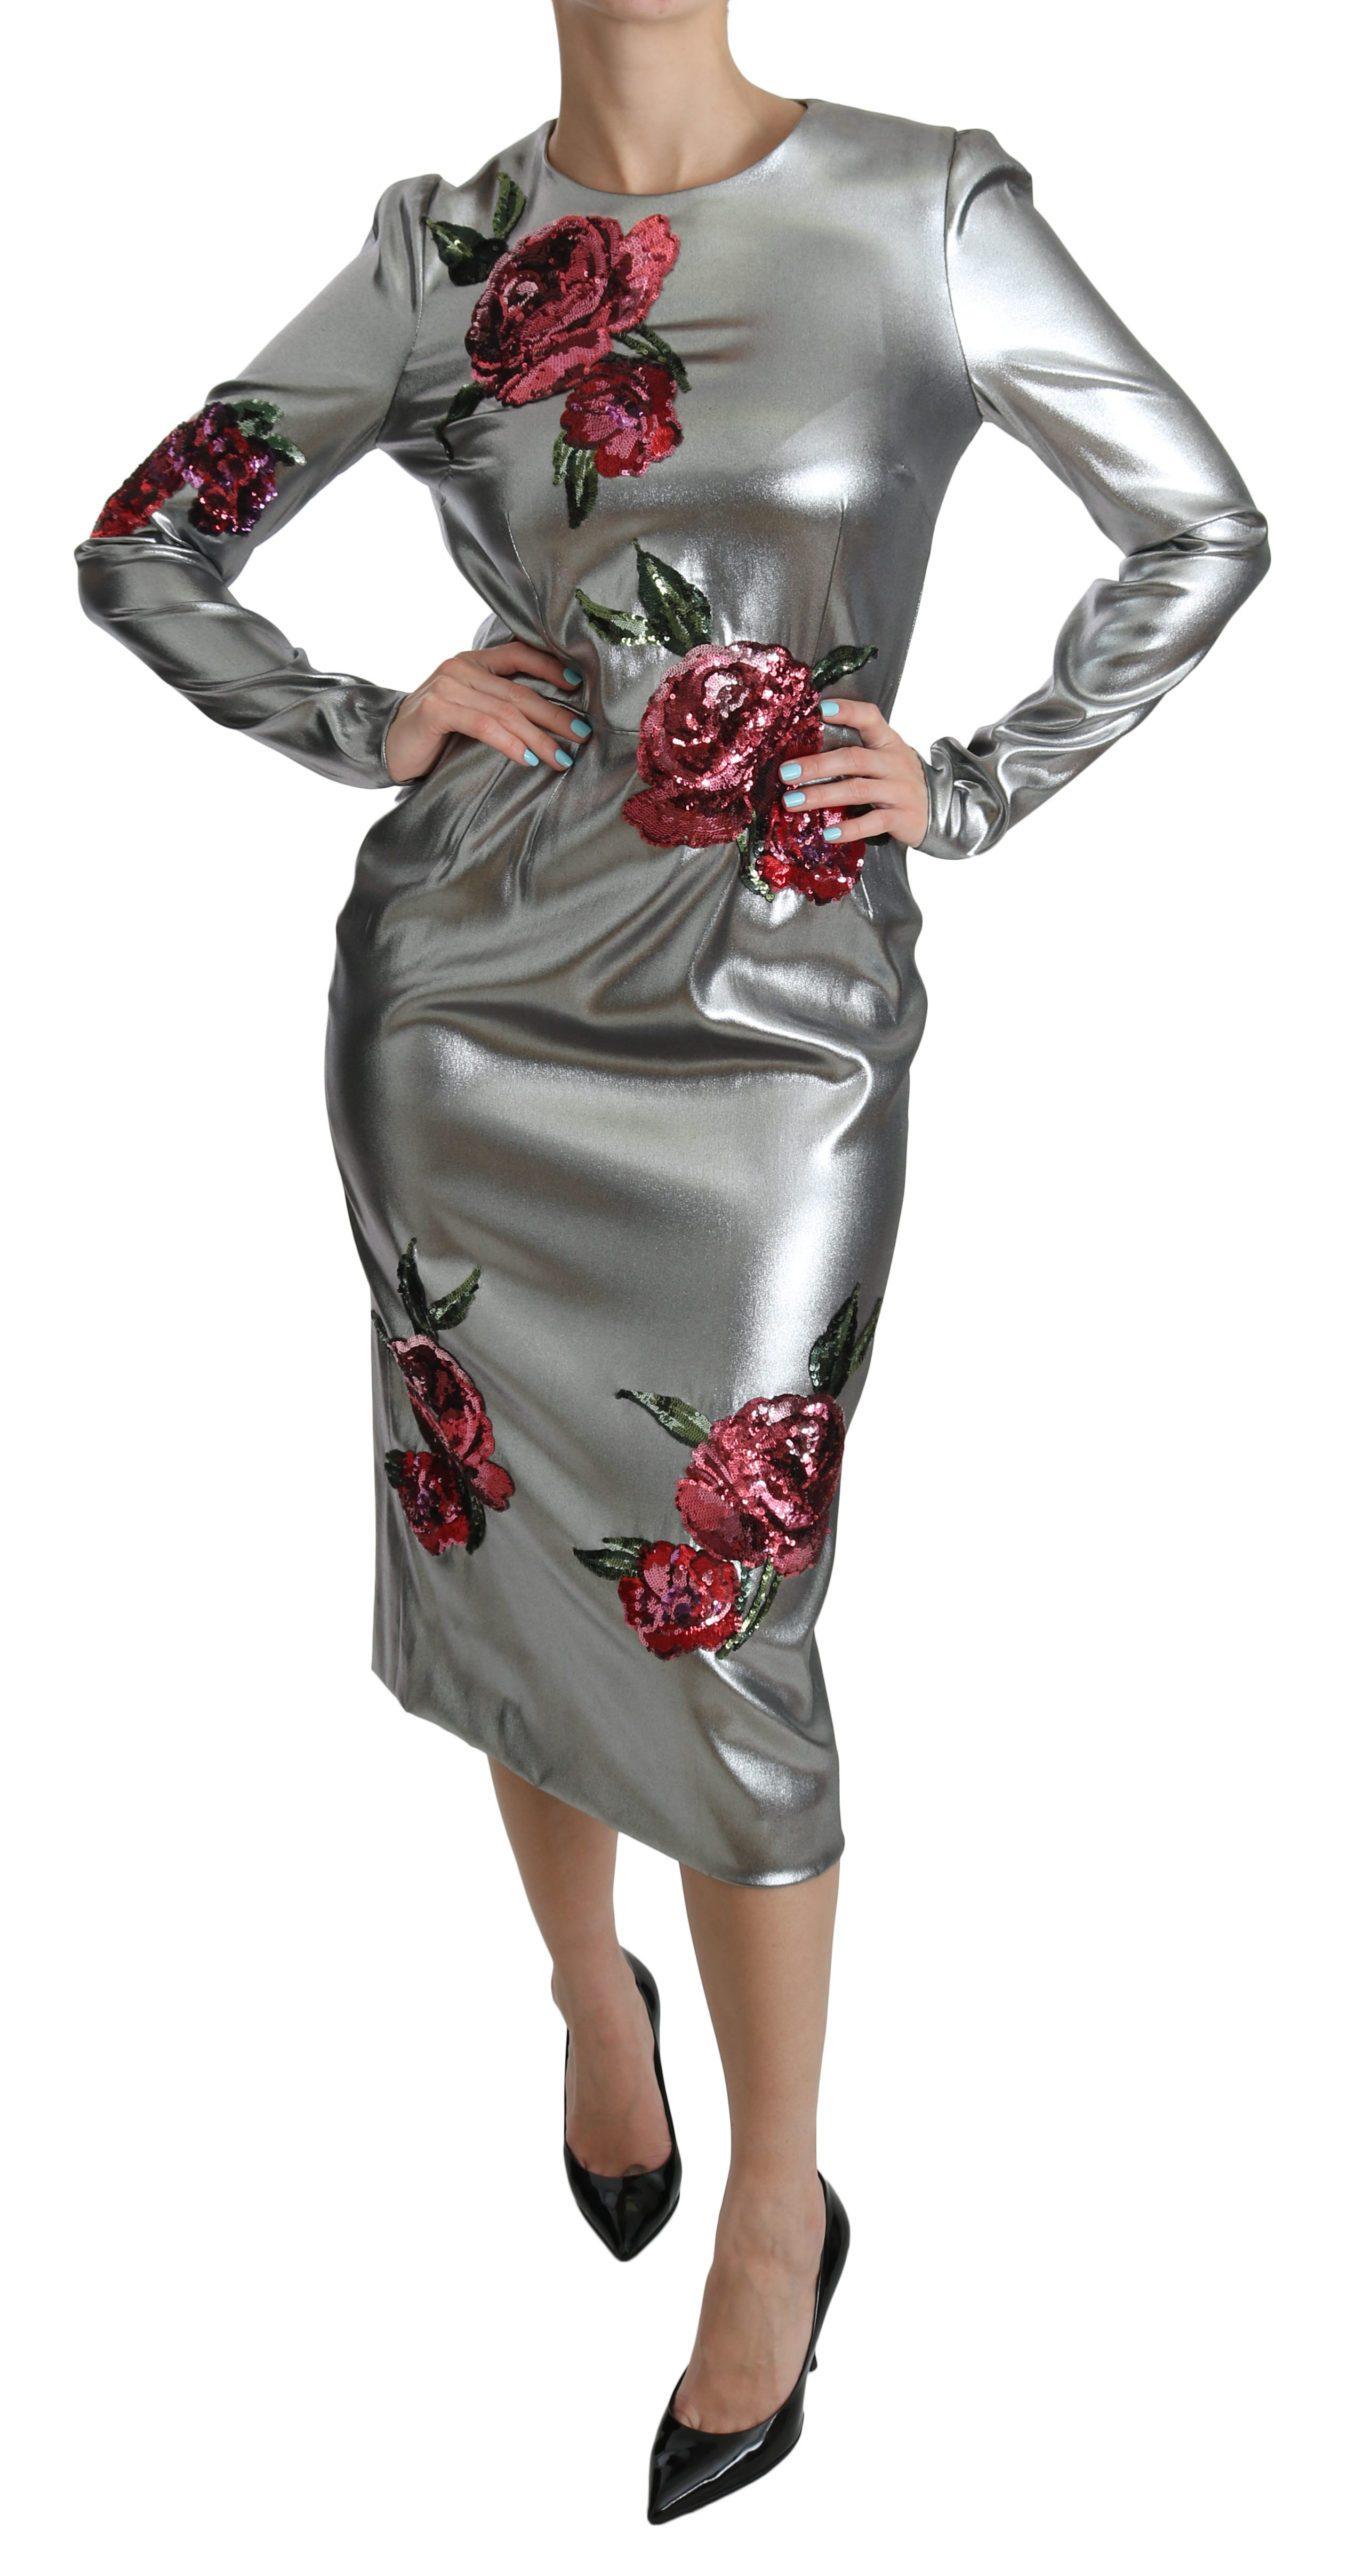 Dolce & Gabbana Women's Silk Stretch Roses Sheath Dress Silver DR2046 - IT44|L